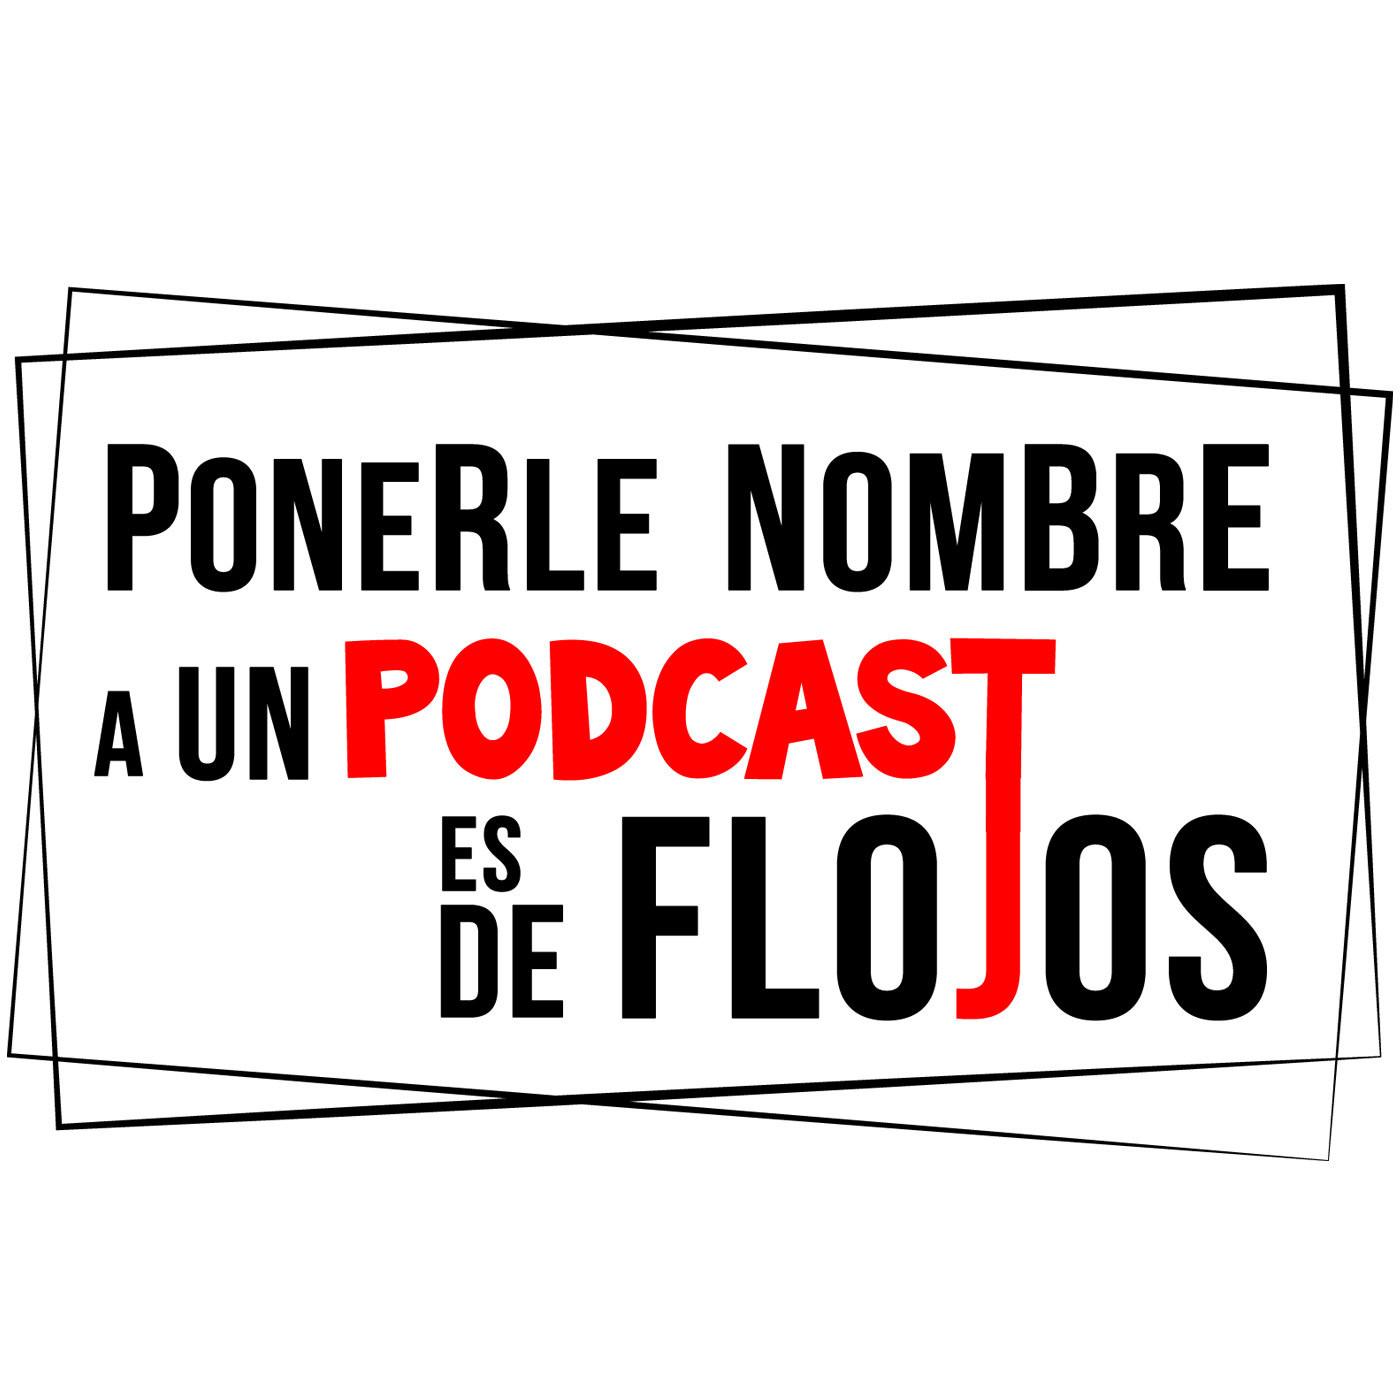 <![CDATA[Ponerle Nombre a un Podcast es de Flojos]]>